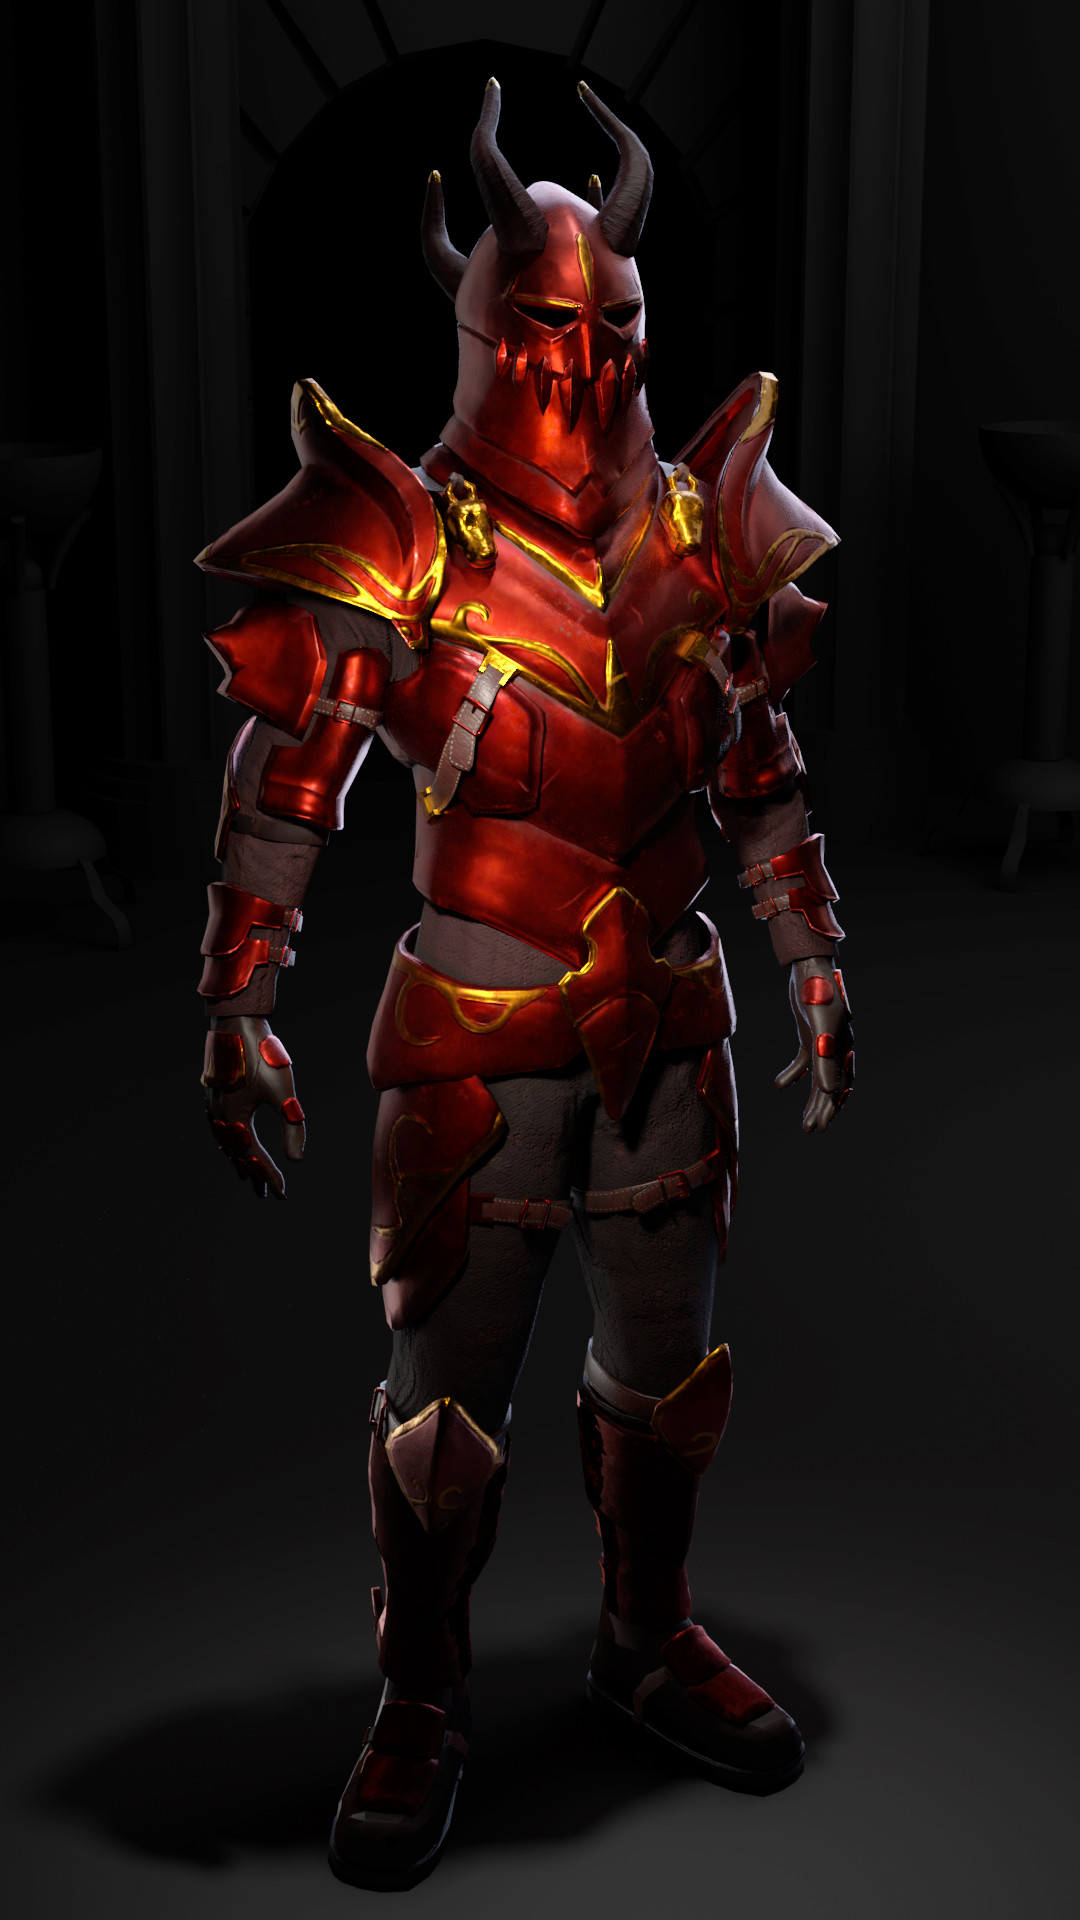 Martin Nagy Rs Dragon Armor G 1280 x 720 jpeg 110 кб. martin nagy rs dragon armor g